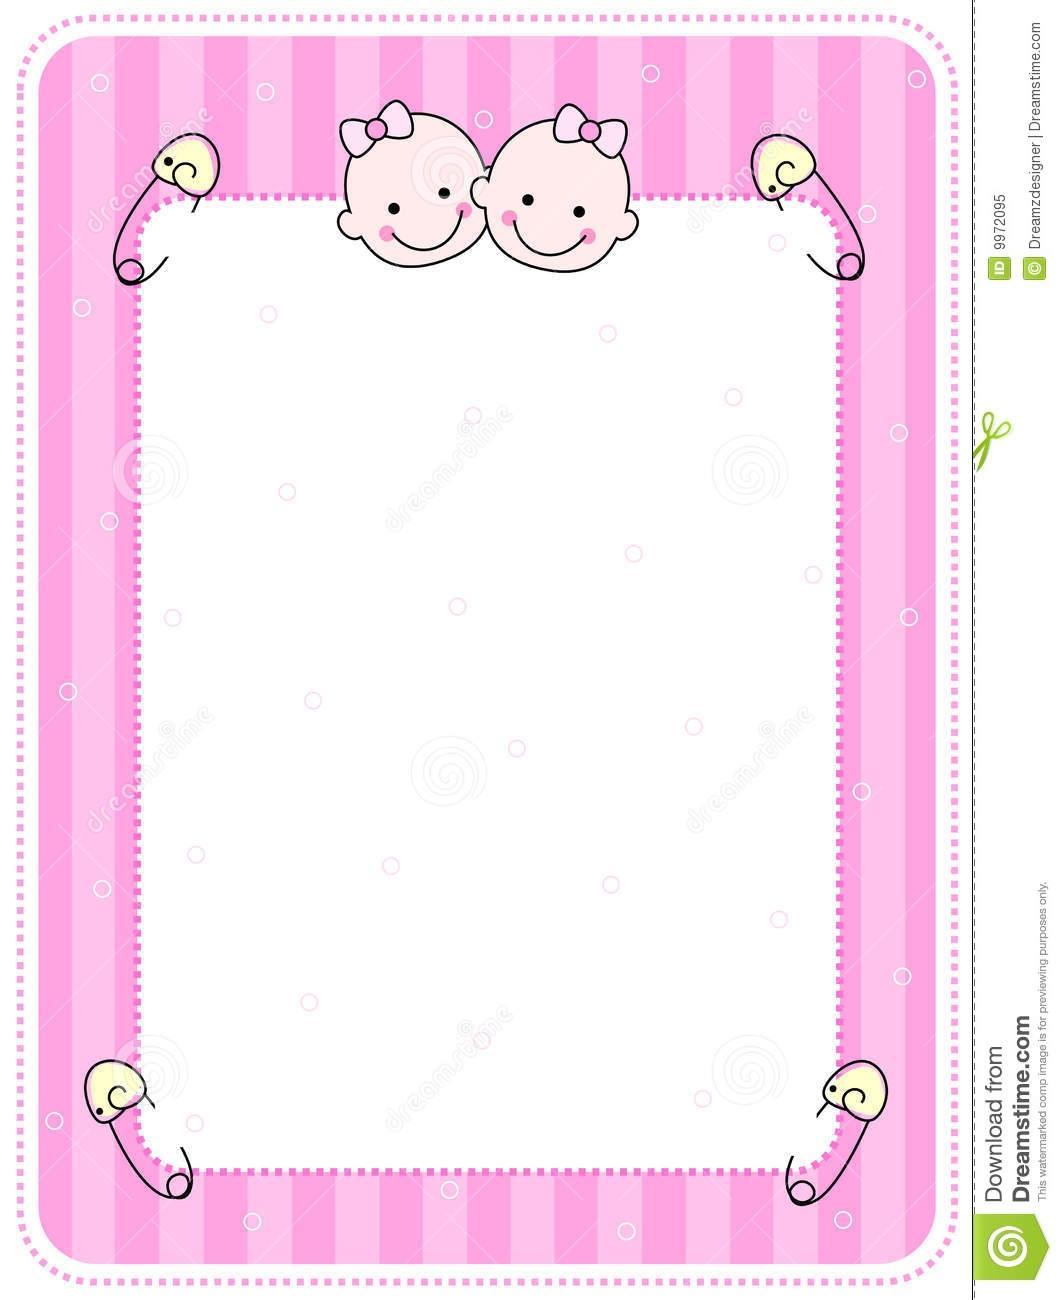 Similiar Baby Girl Borders Frames Keywords.